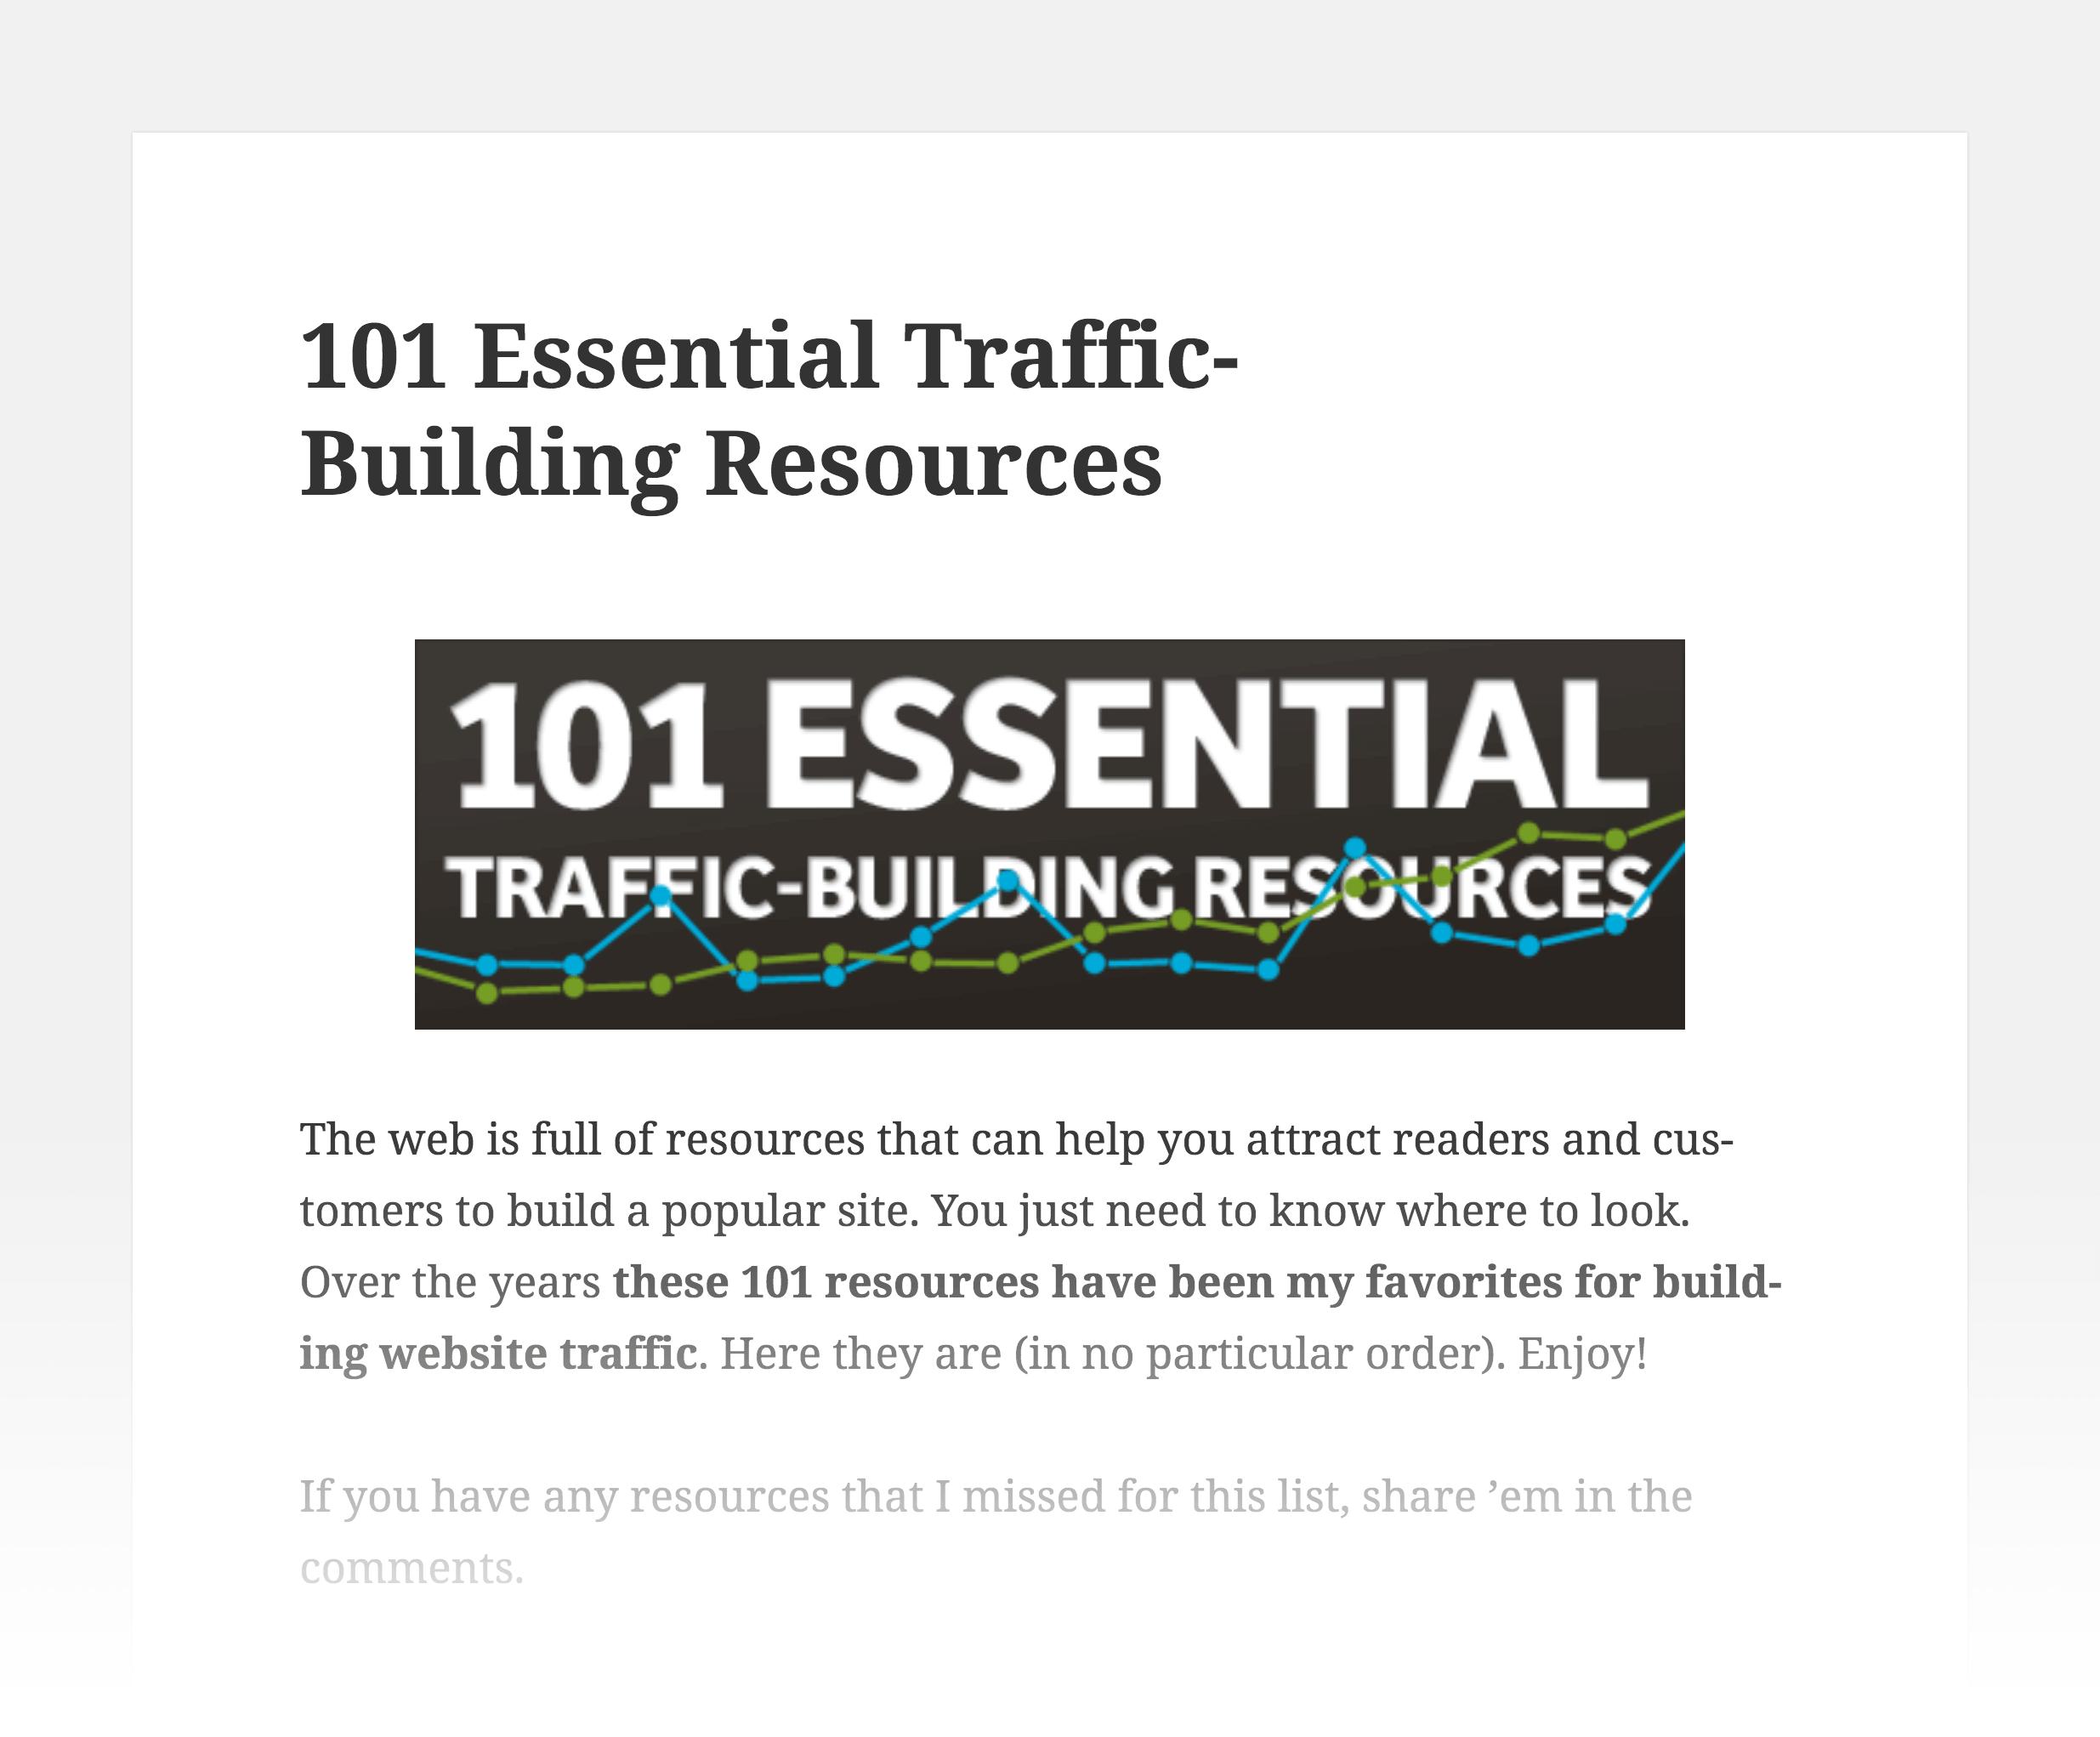 Essential traffic building resources